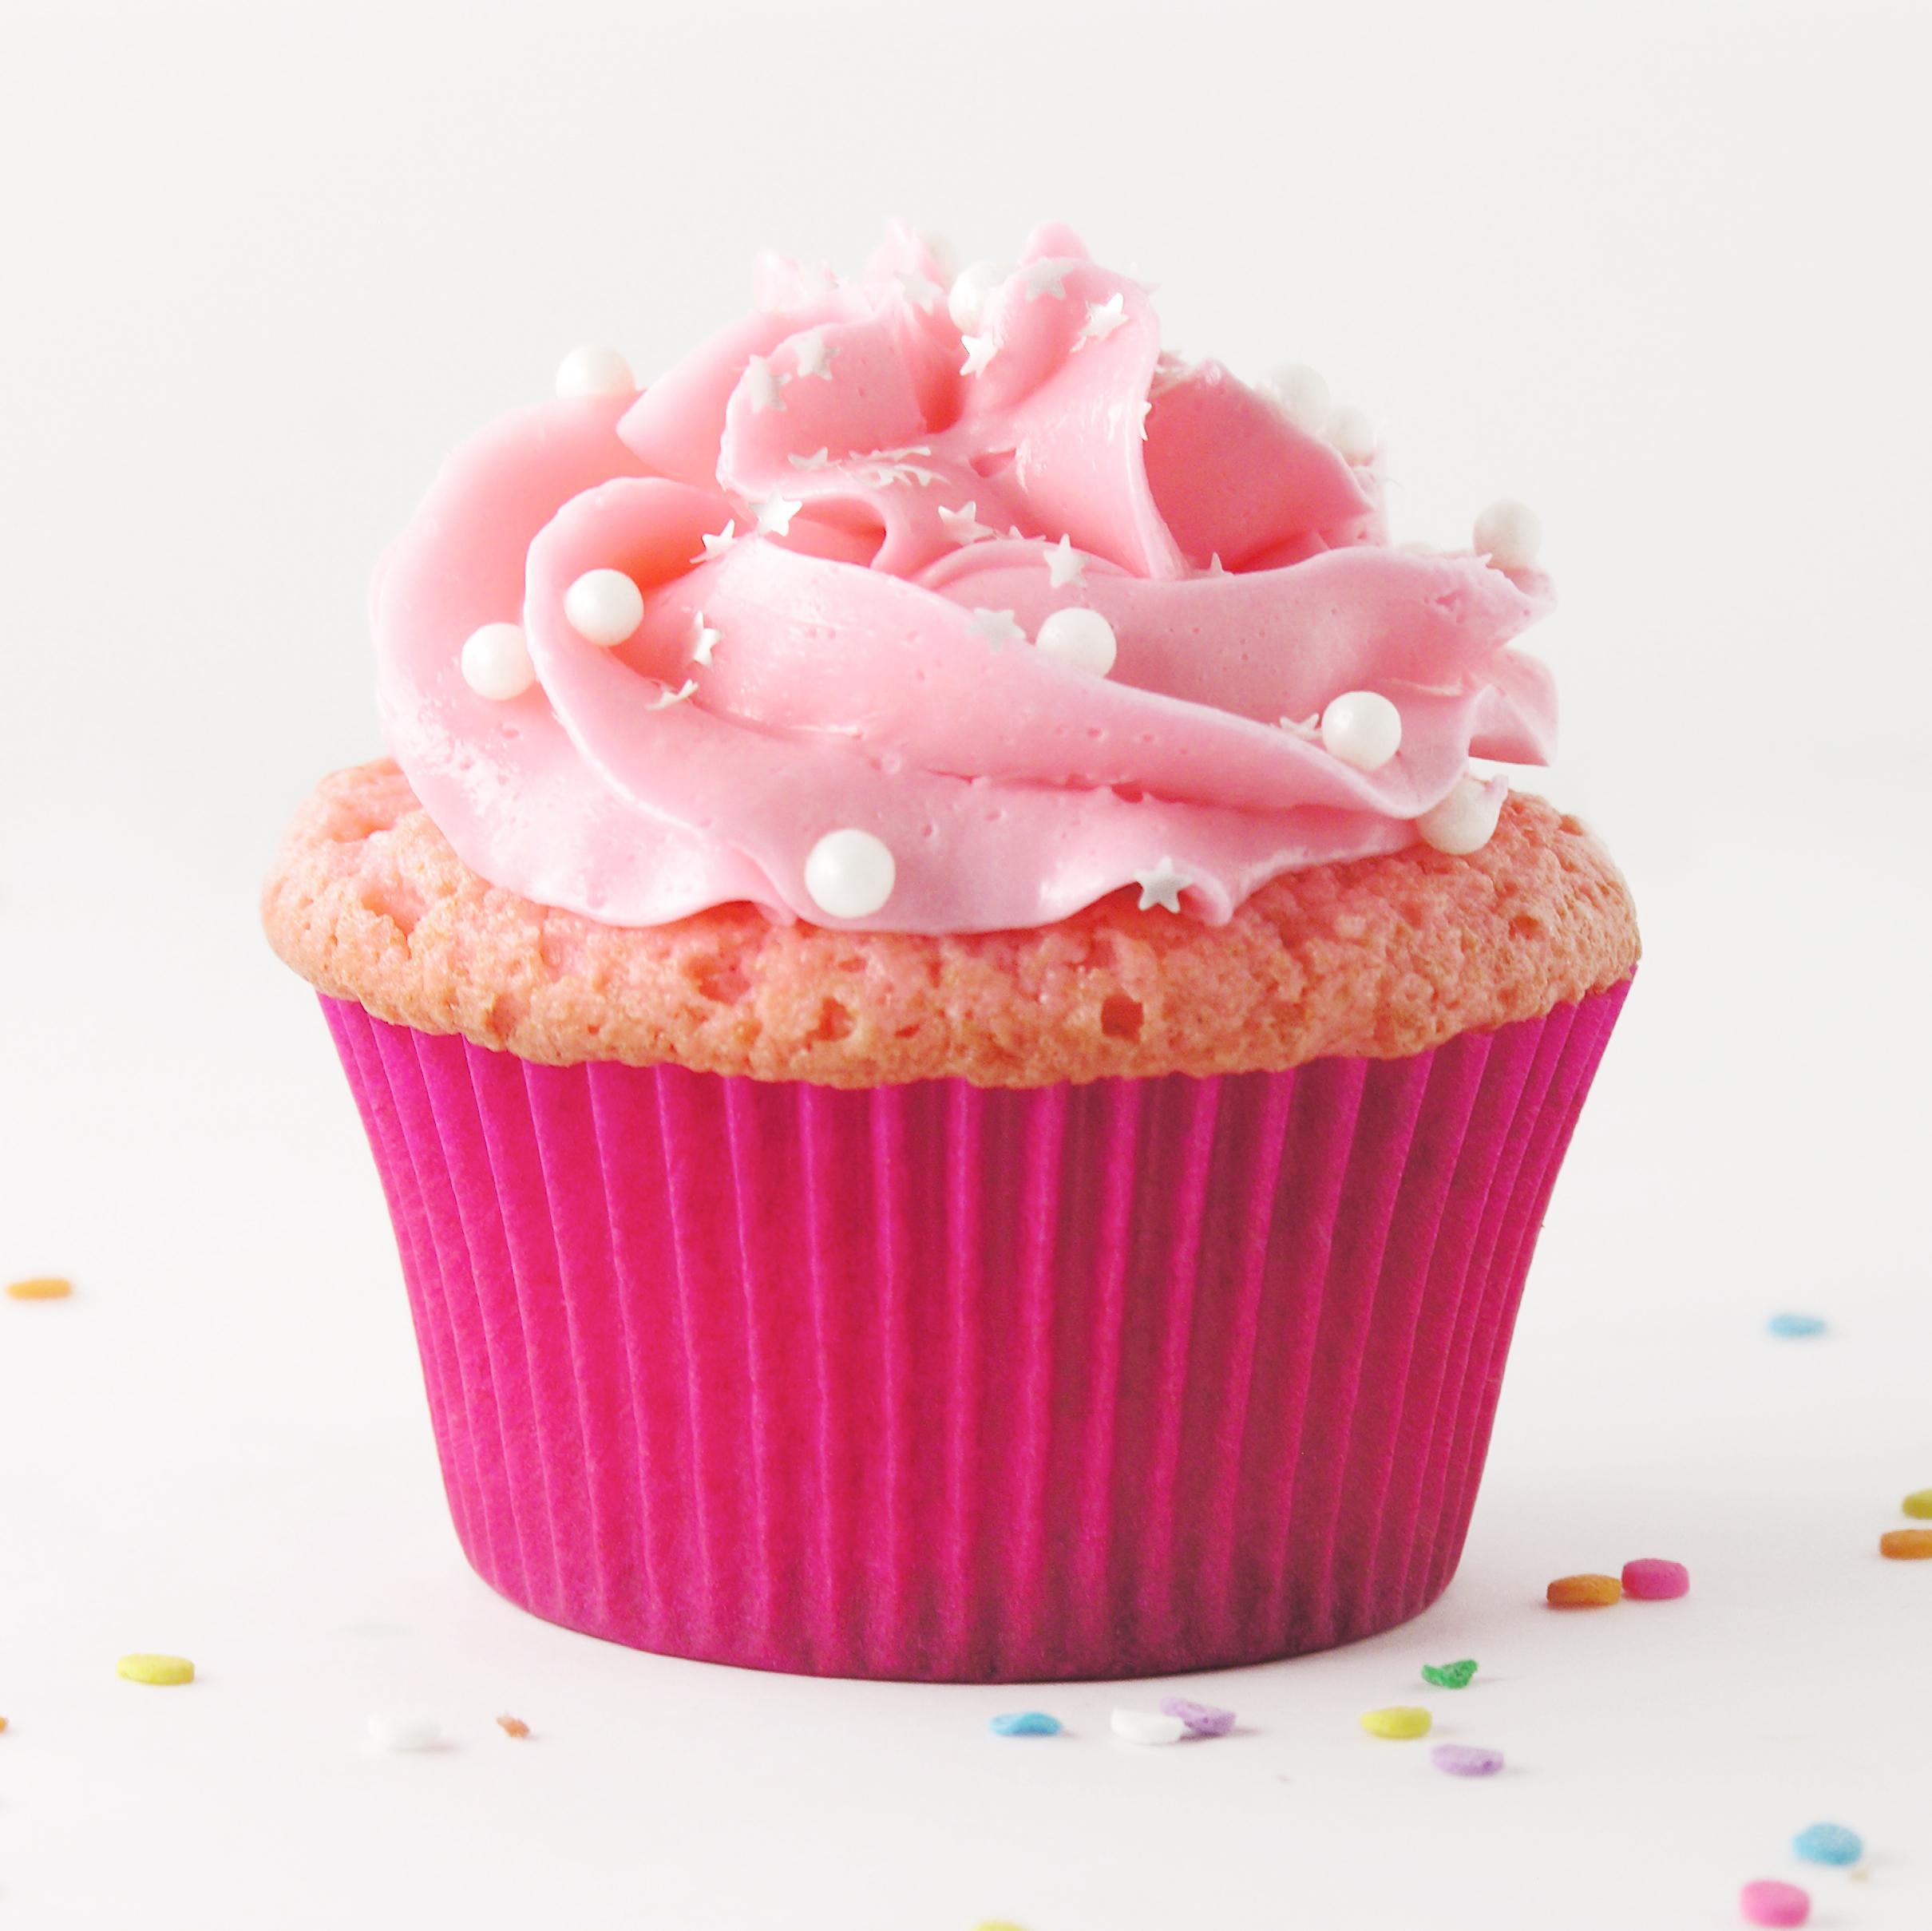 The cupcakes cupcake — photo 13